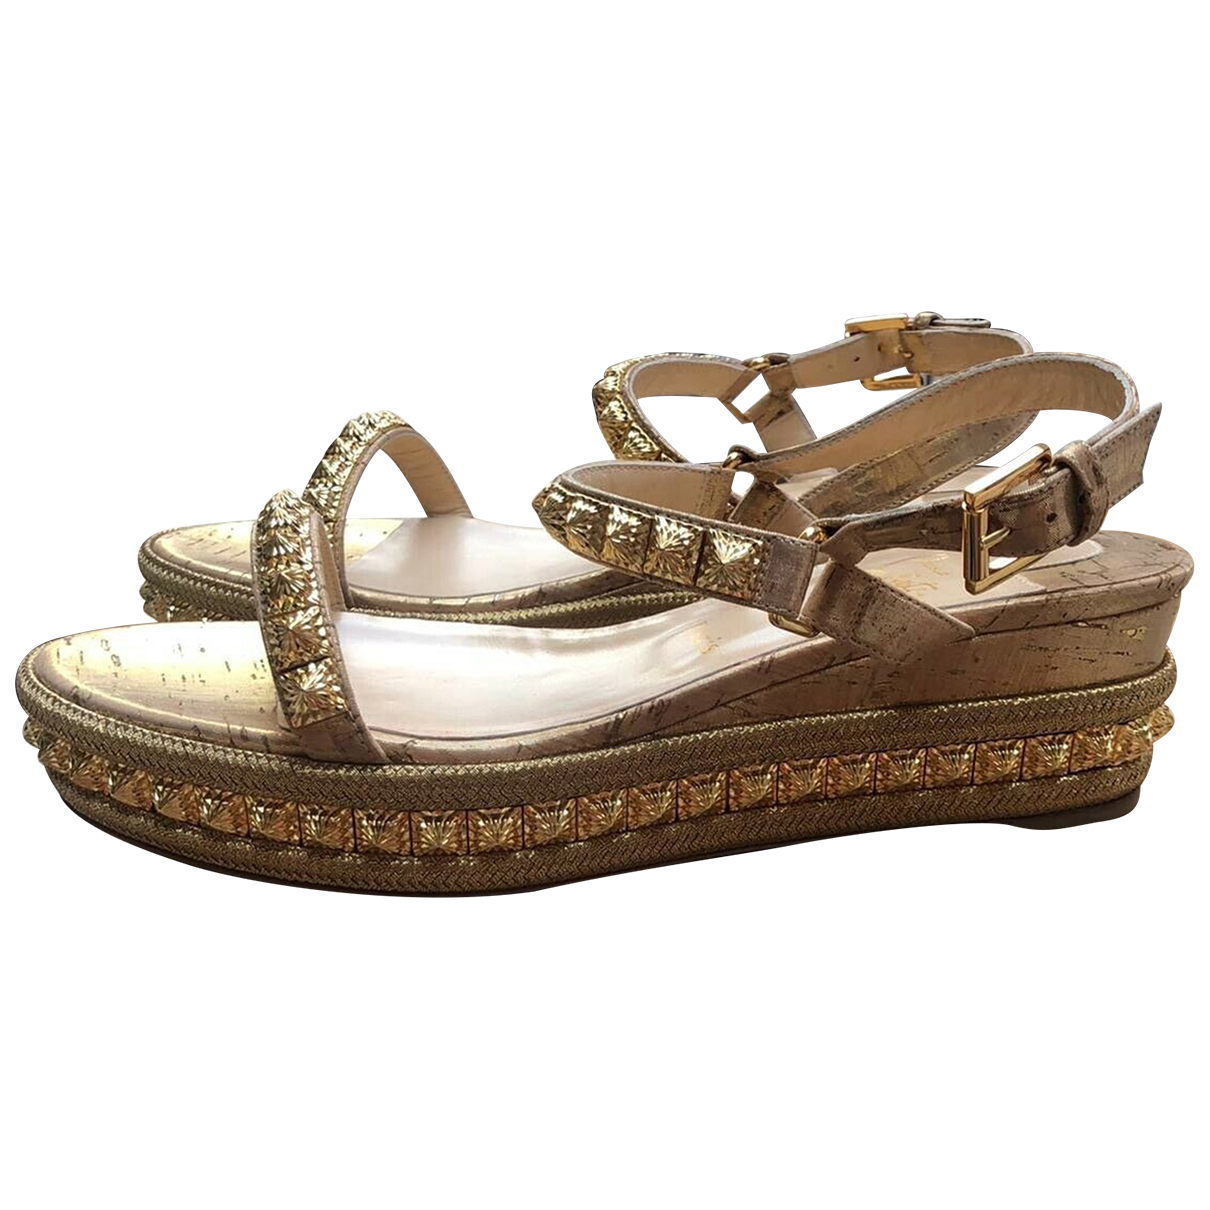 Sandalias de Cuero Christian Louboutin